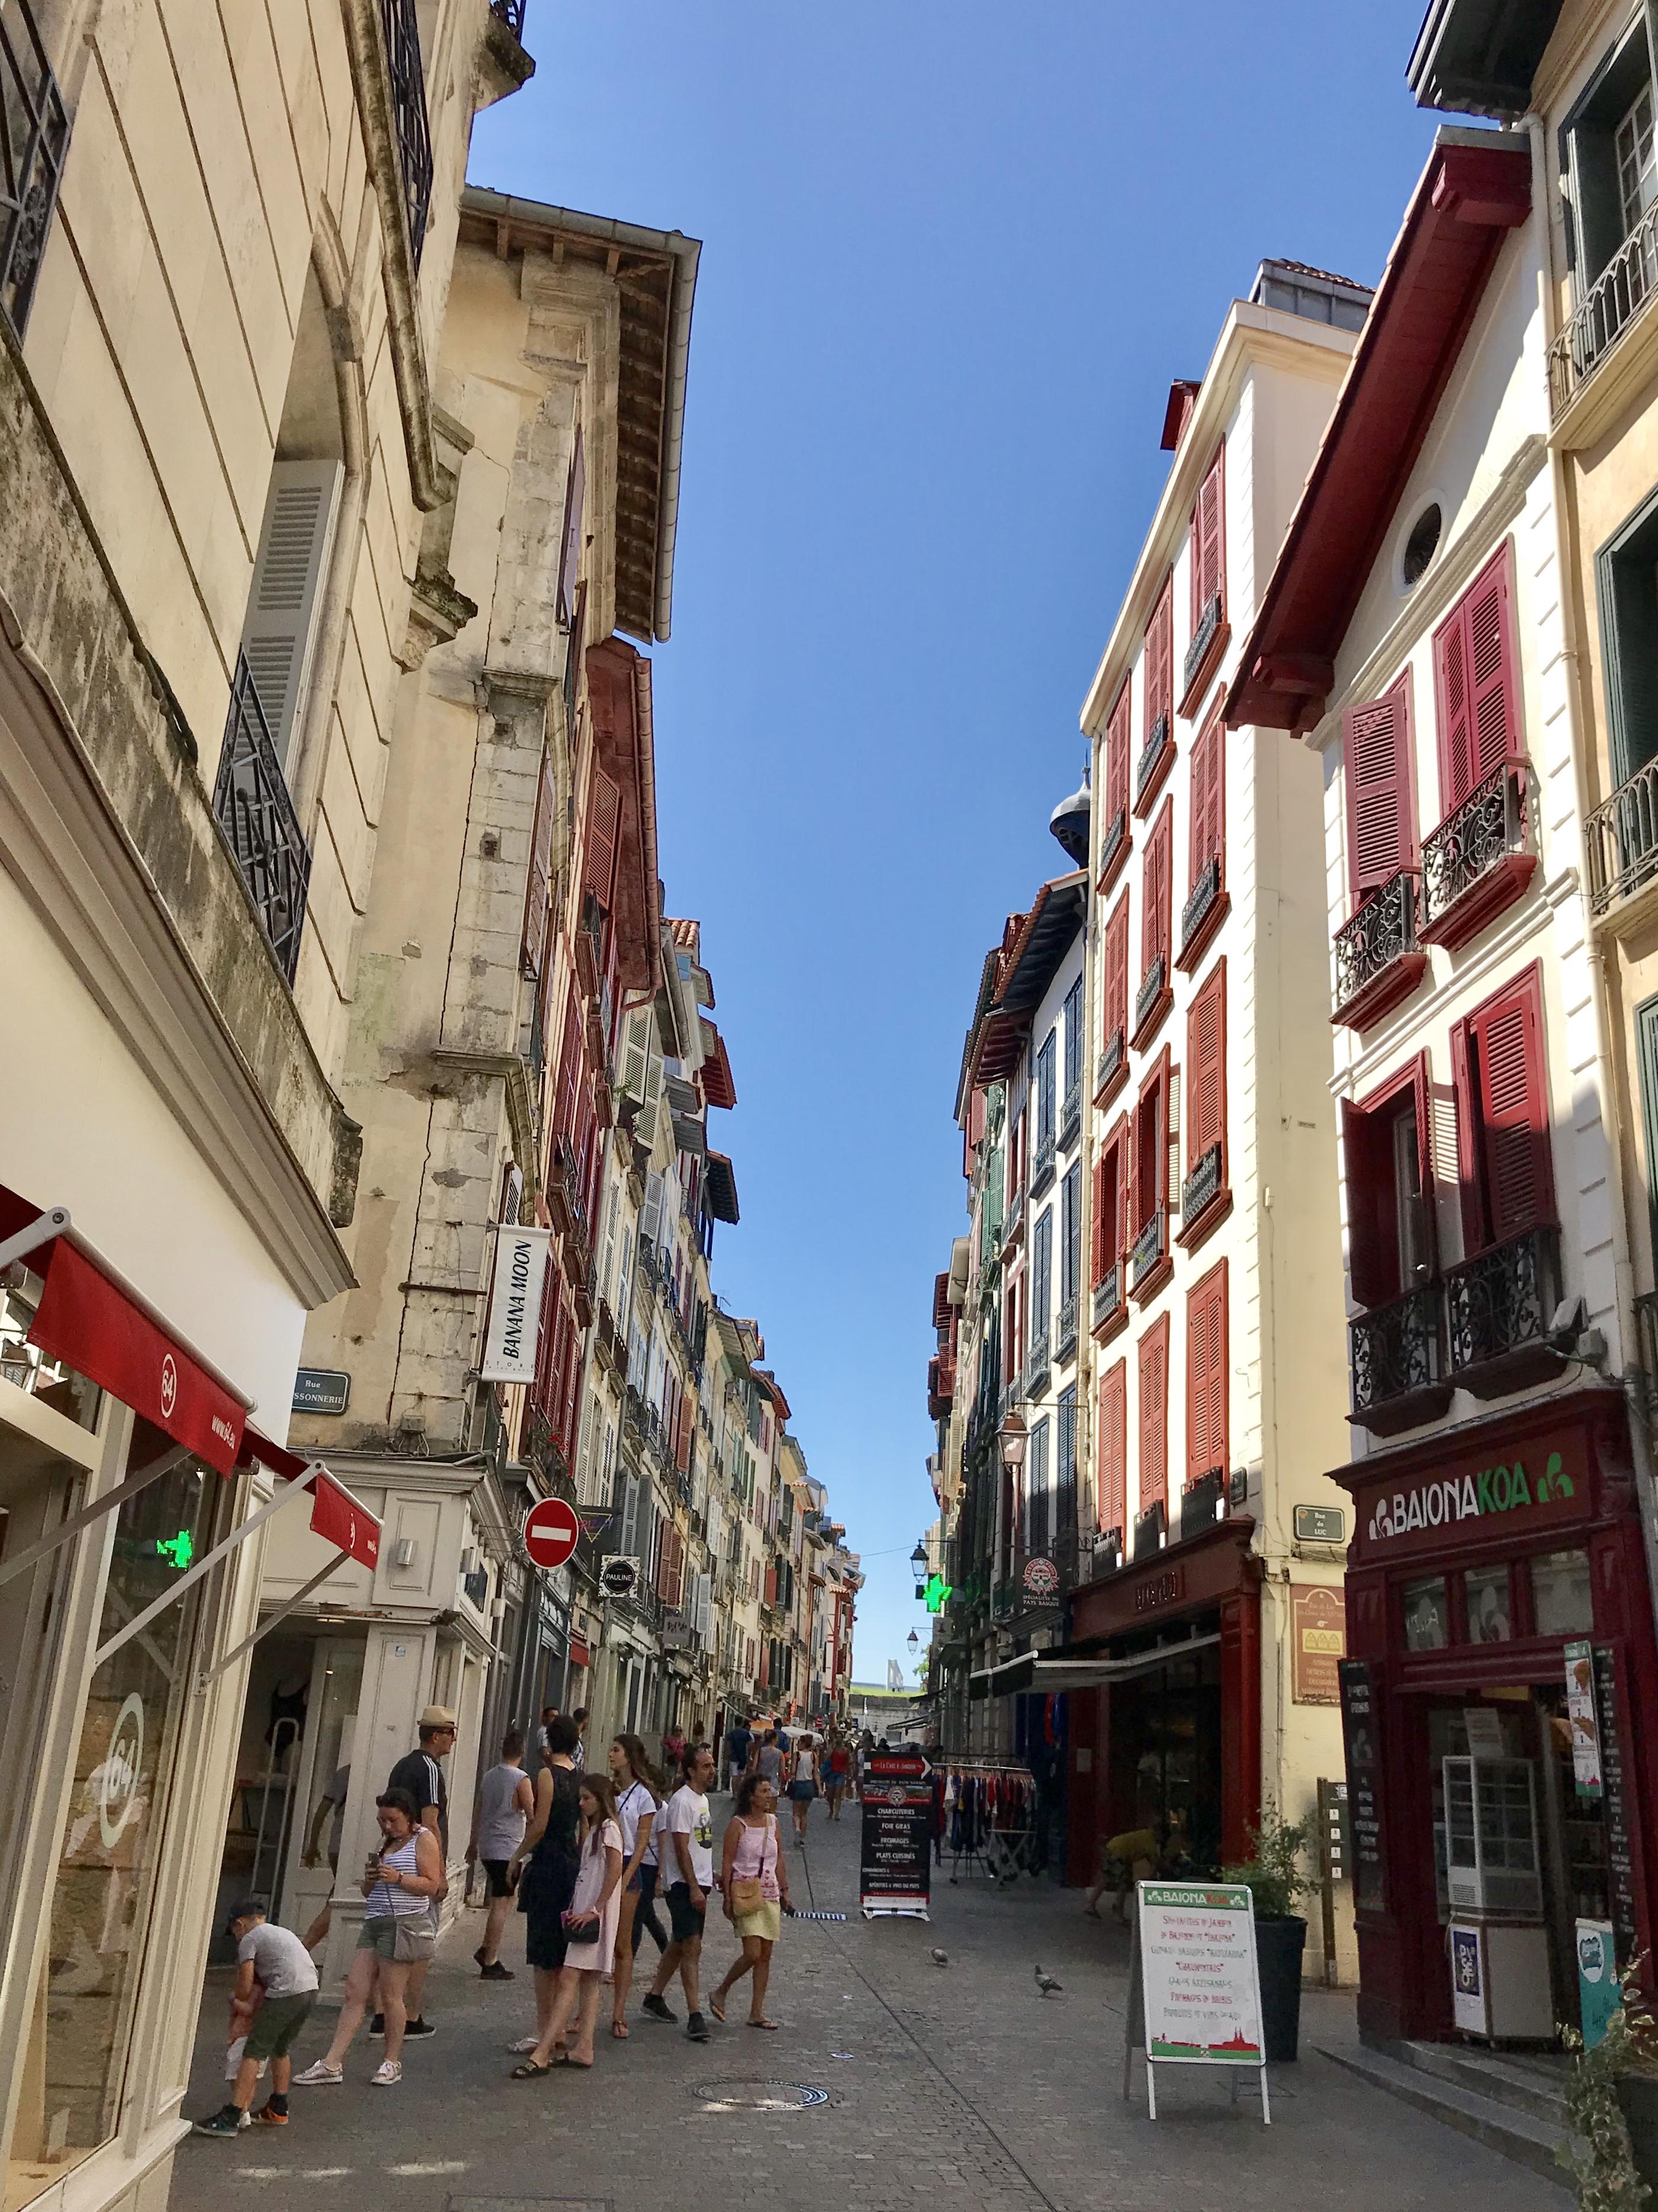 visiter bayonne rue d'espagne